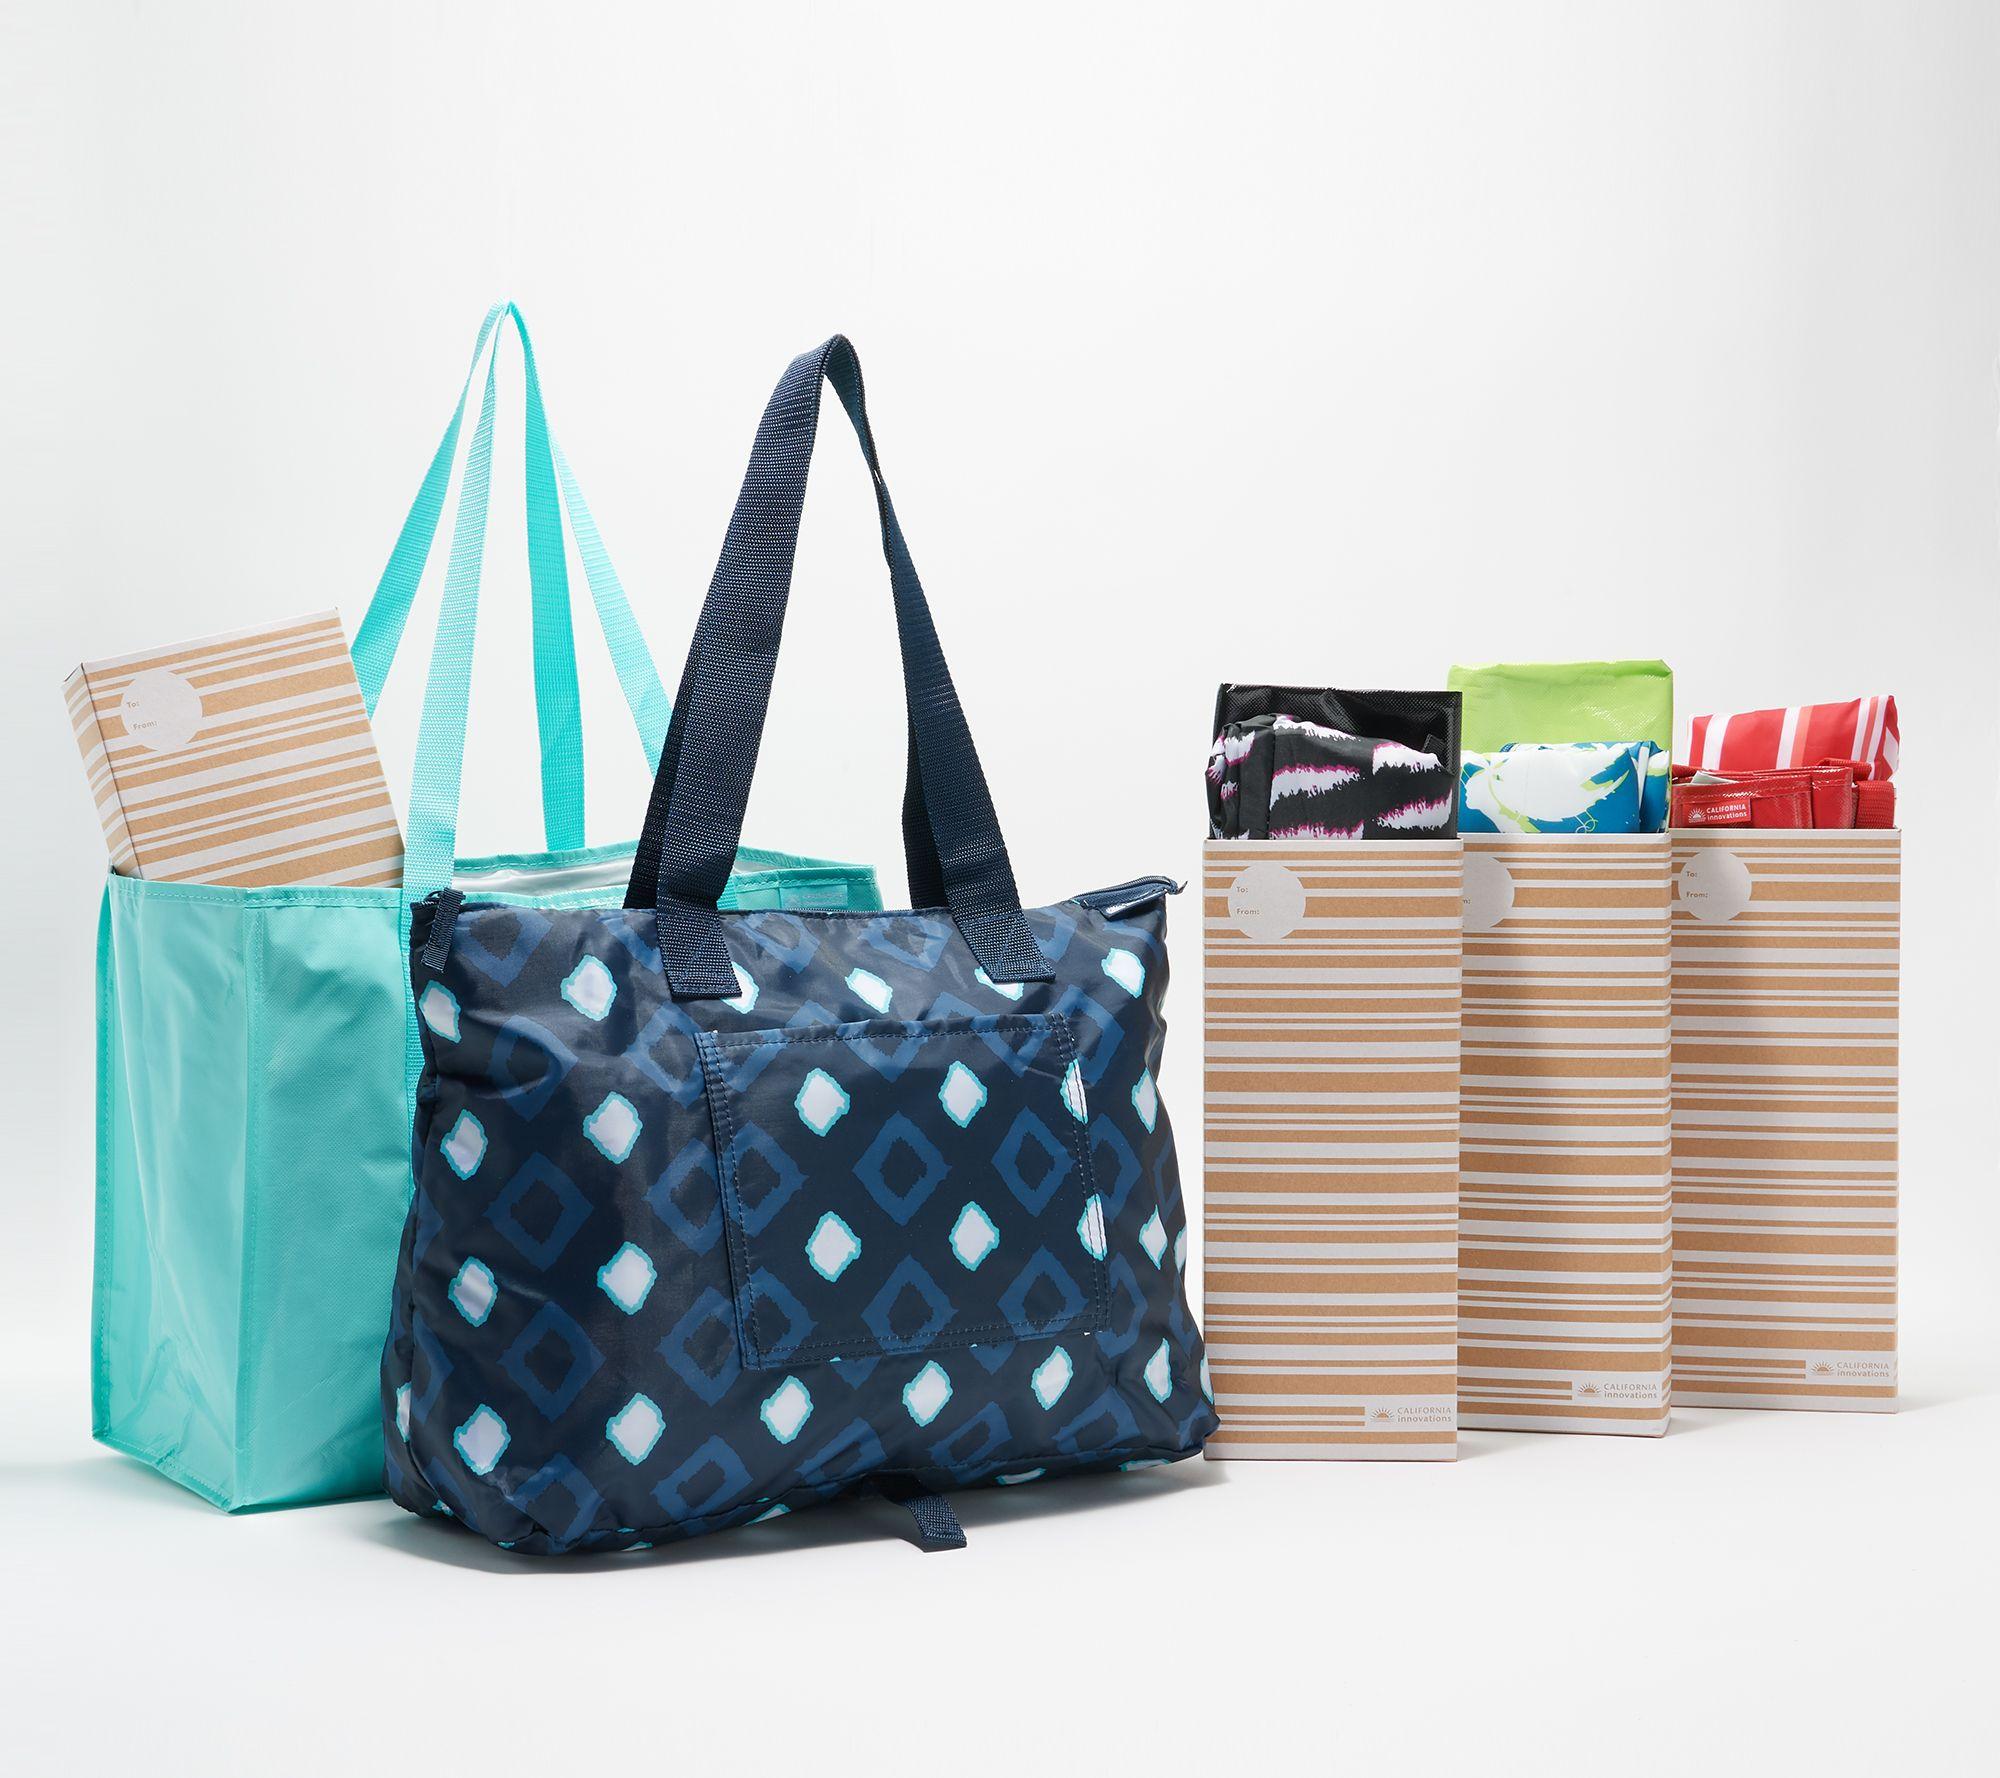 Playstion 4 Wide Reusable Bag